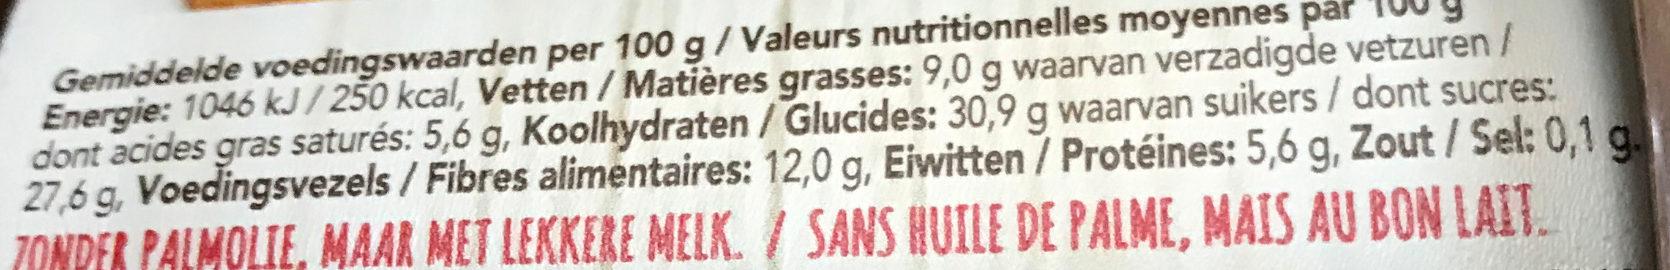 Choco pâte à tartiner au chocolat fondant - Voedingswaarden - fr